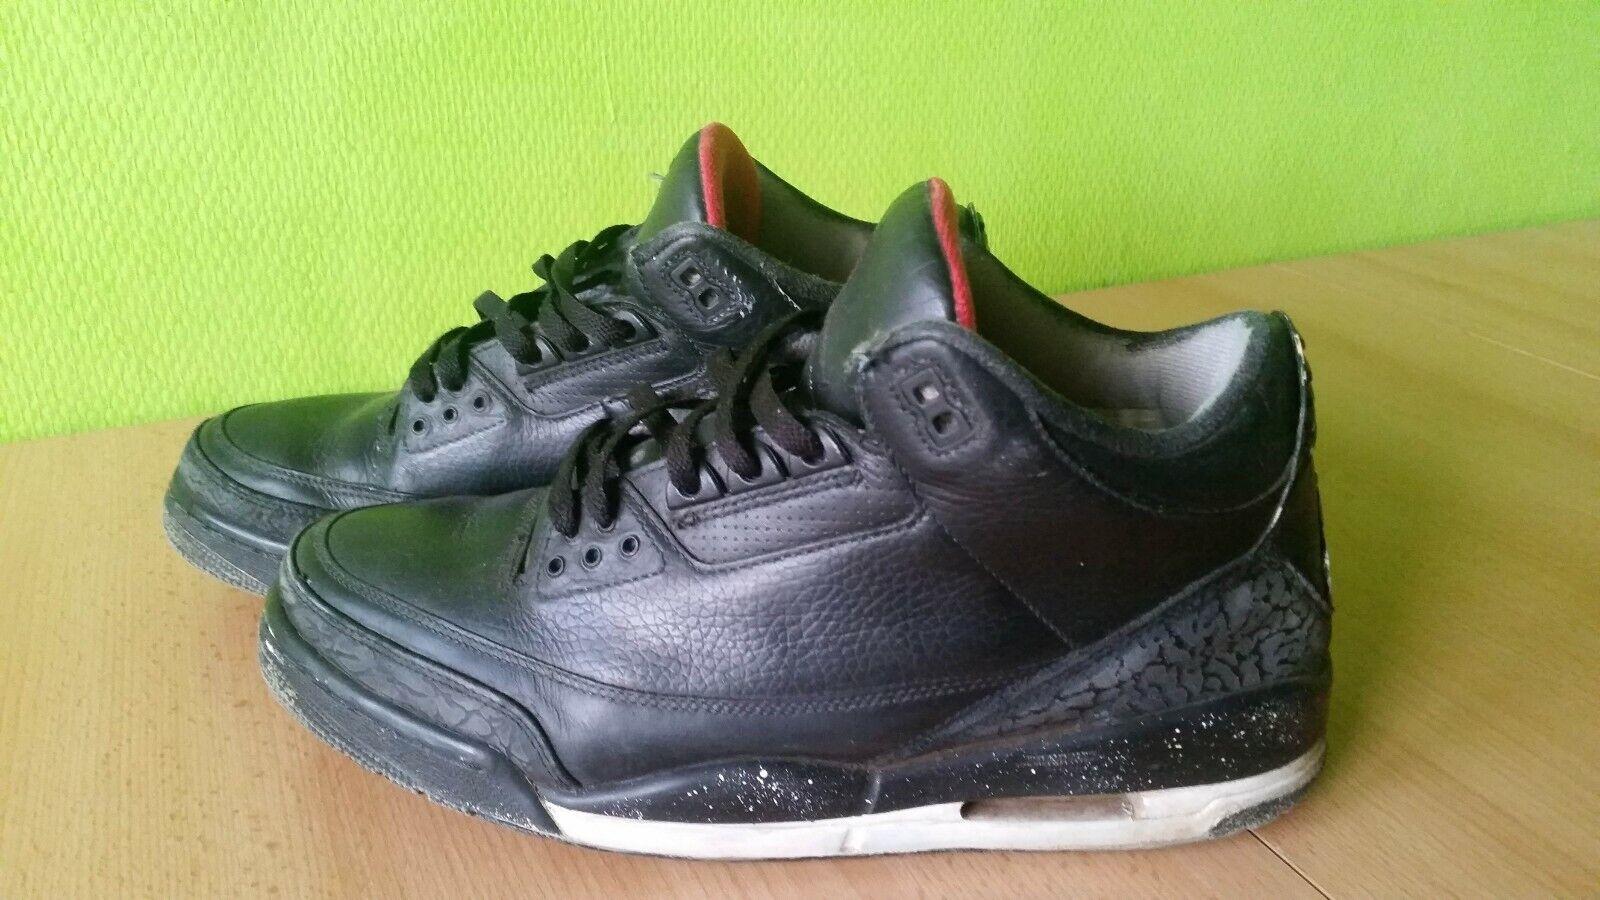 Nike Jordan 2011 Retro Turnschuhe Gr. 44,5 Used Gebraucht  Schuhe Herren